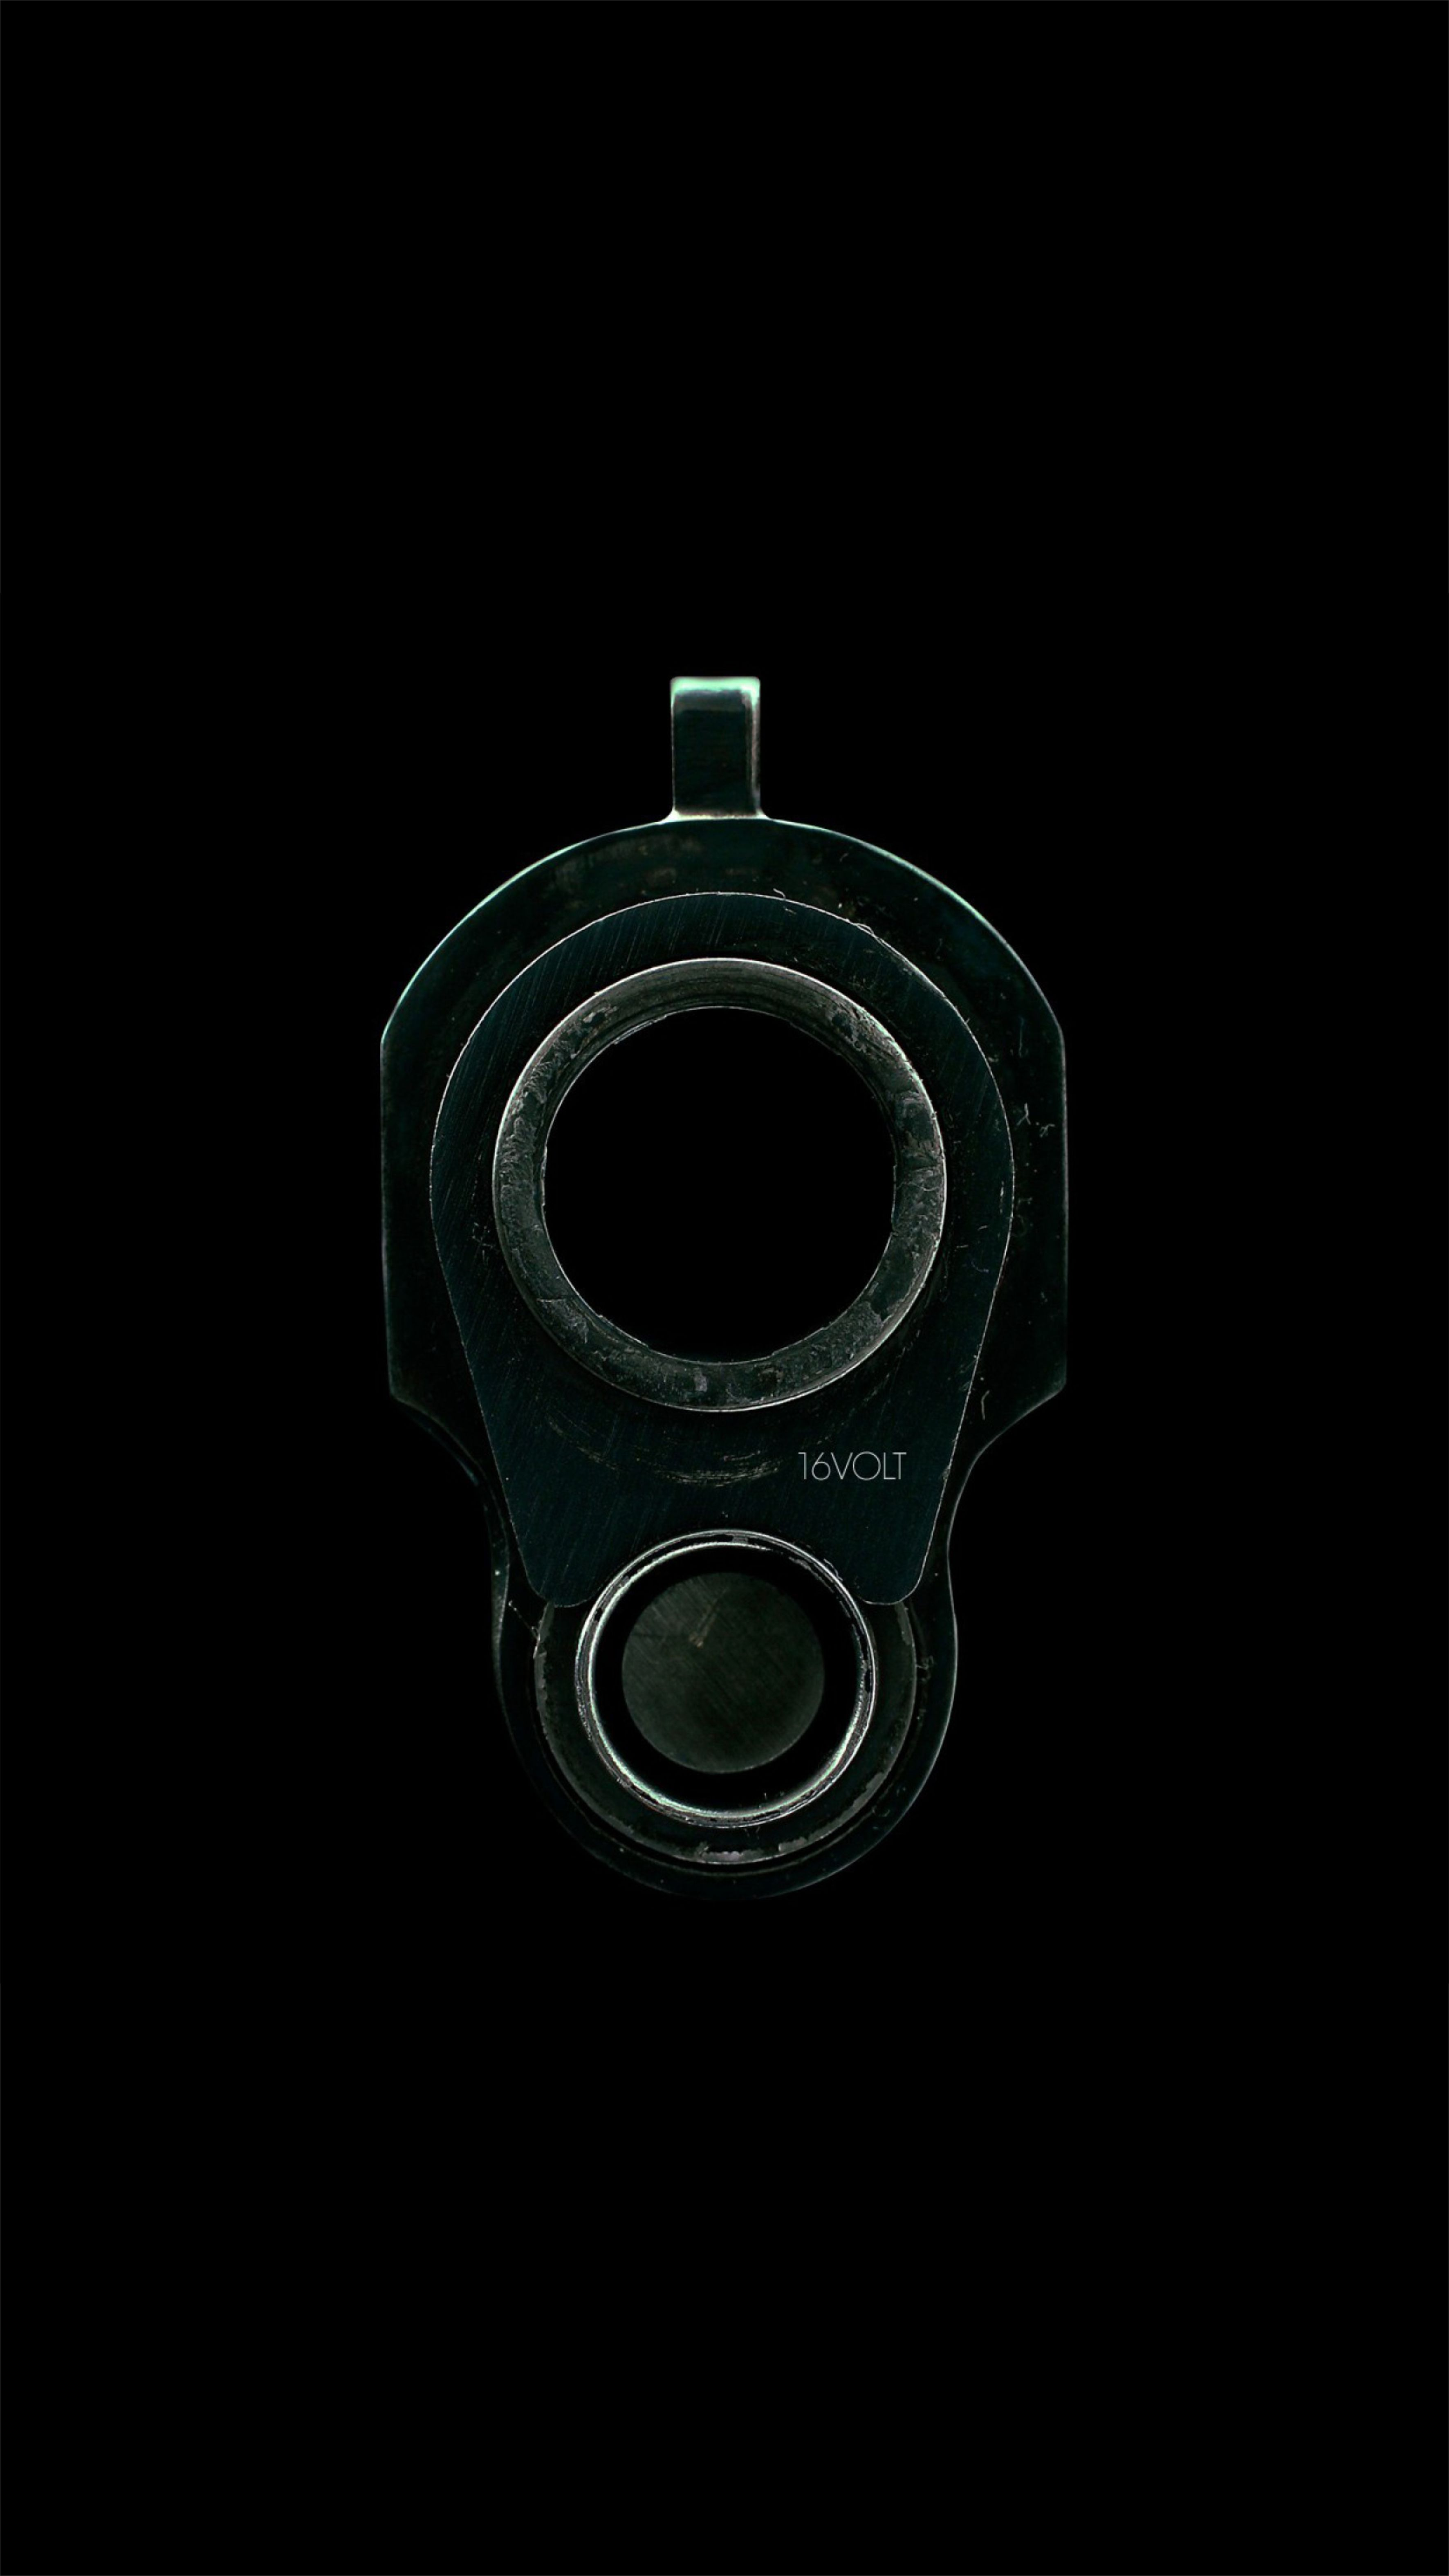 Black gun, iphone 7 plus wallpaper Mine Pinterest